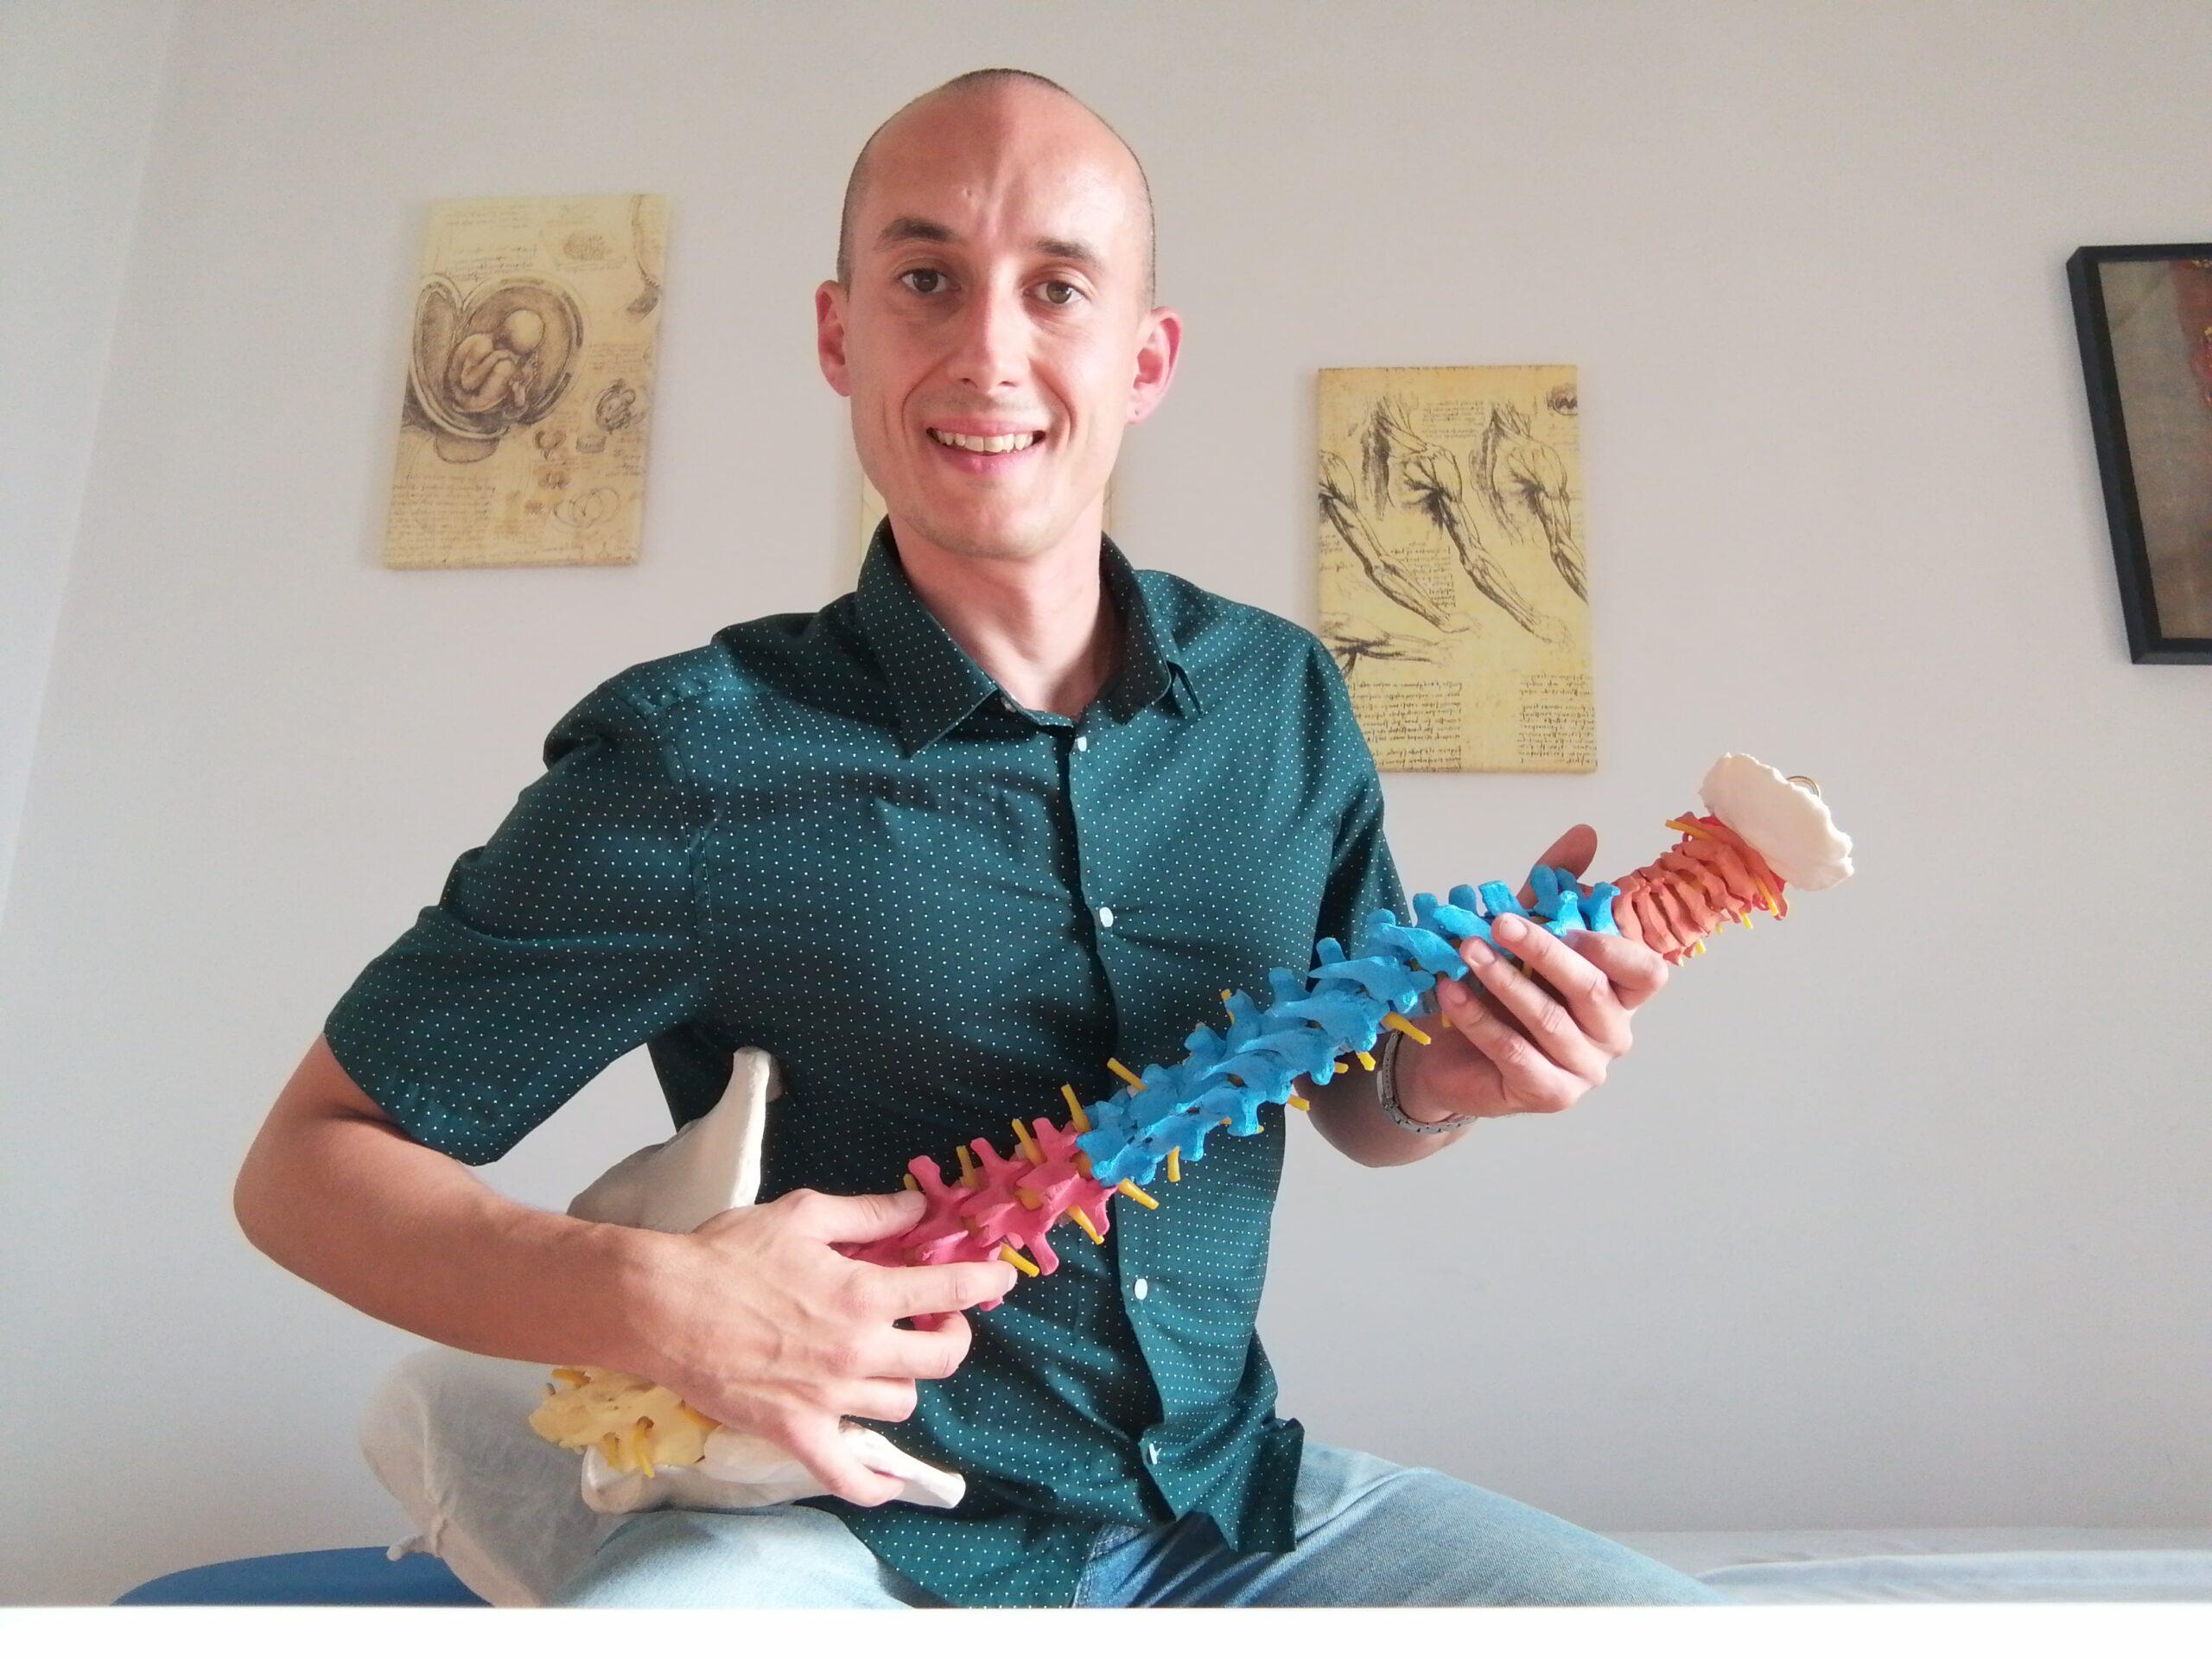 Massoterapia ed osteopatia strutturale Roma - Christian Giusti Massoterapista - Osteopatia strutturale, viscerale, terapia cranio sacrale, massoterapia sportiva